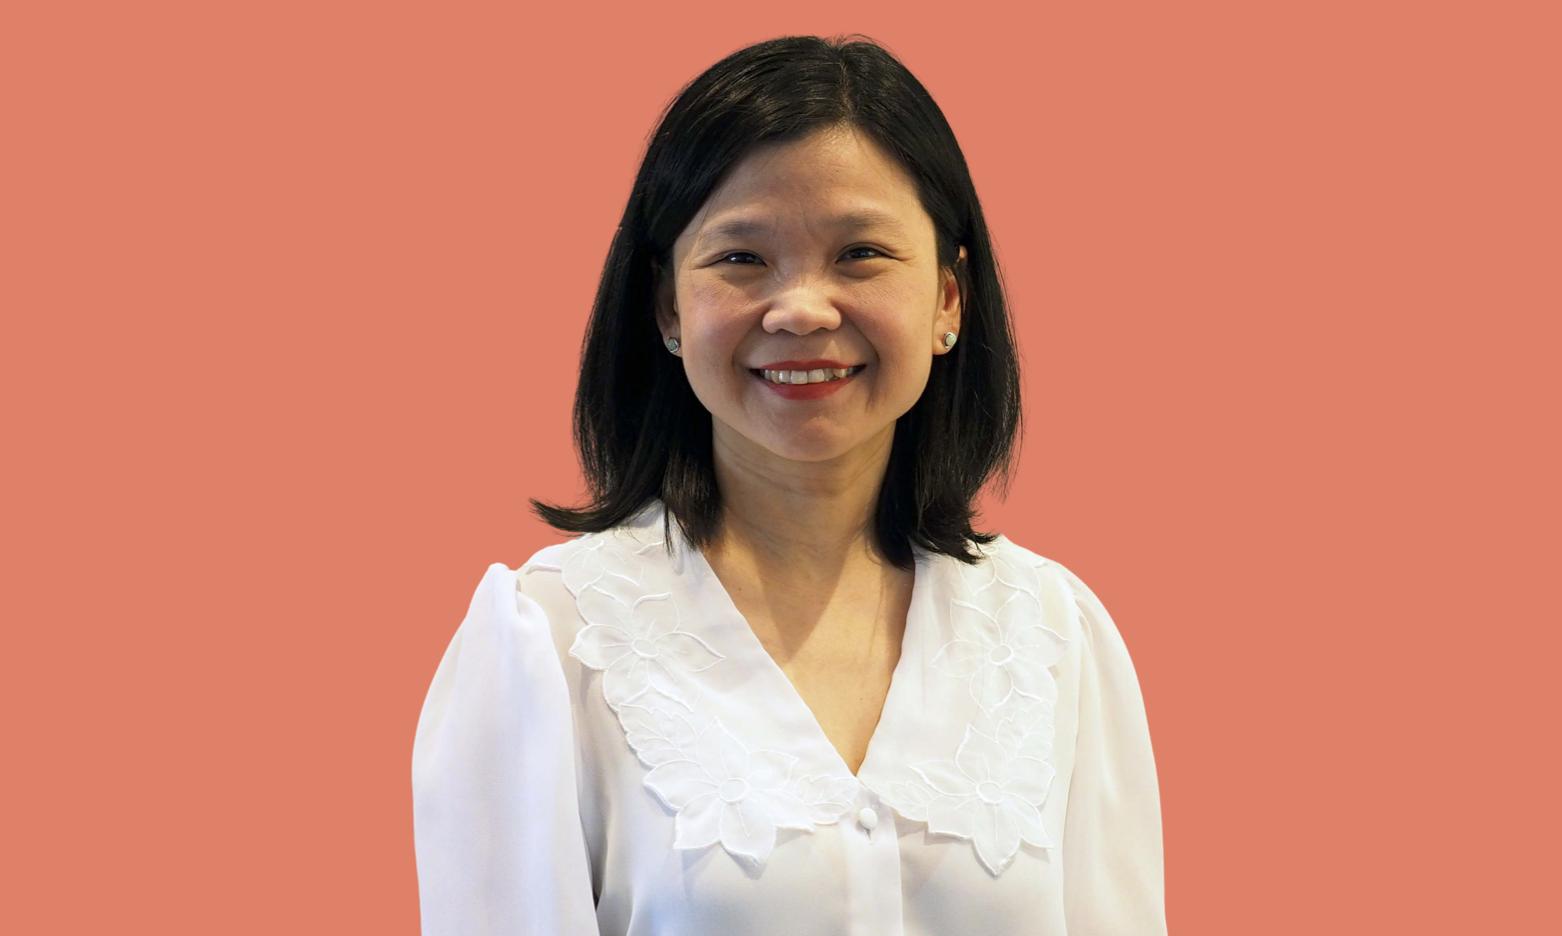 Li-Yeng Choo